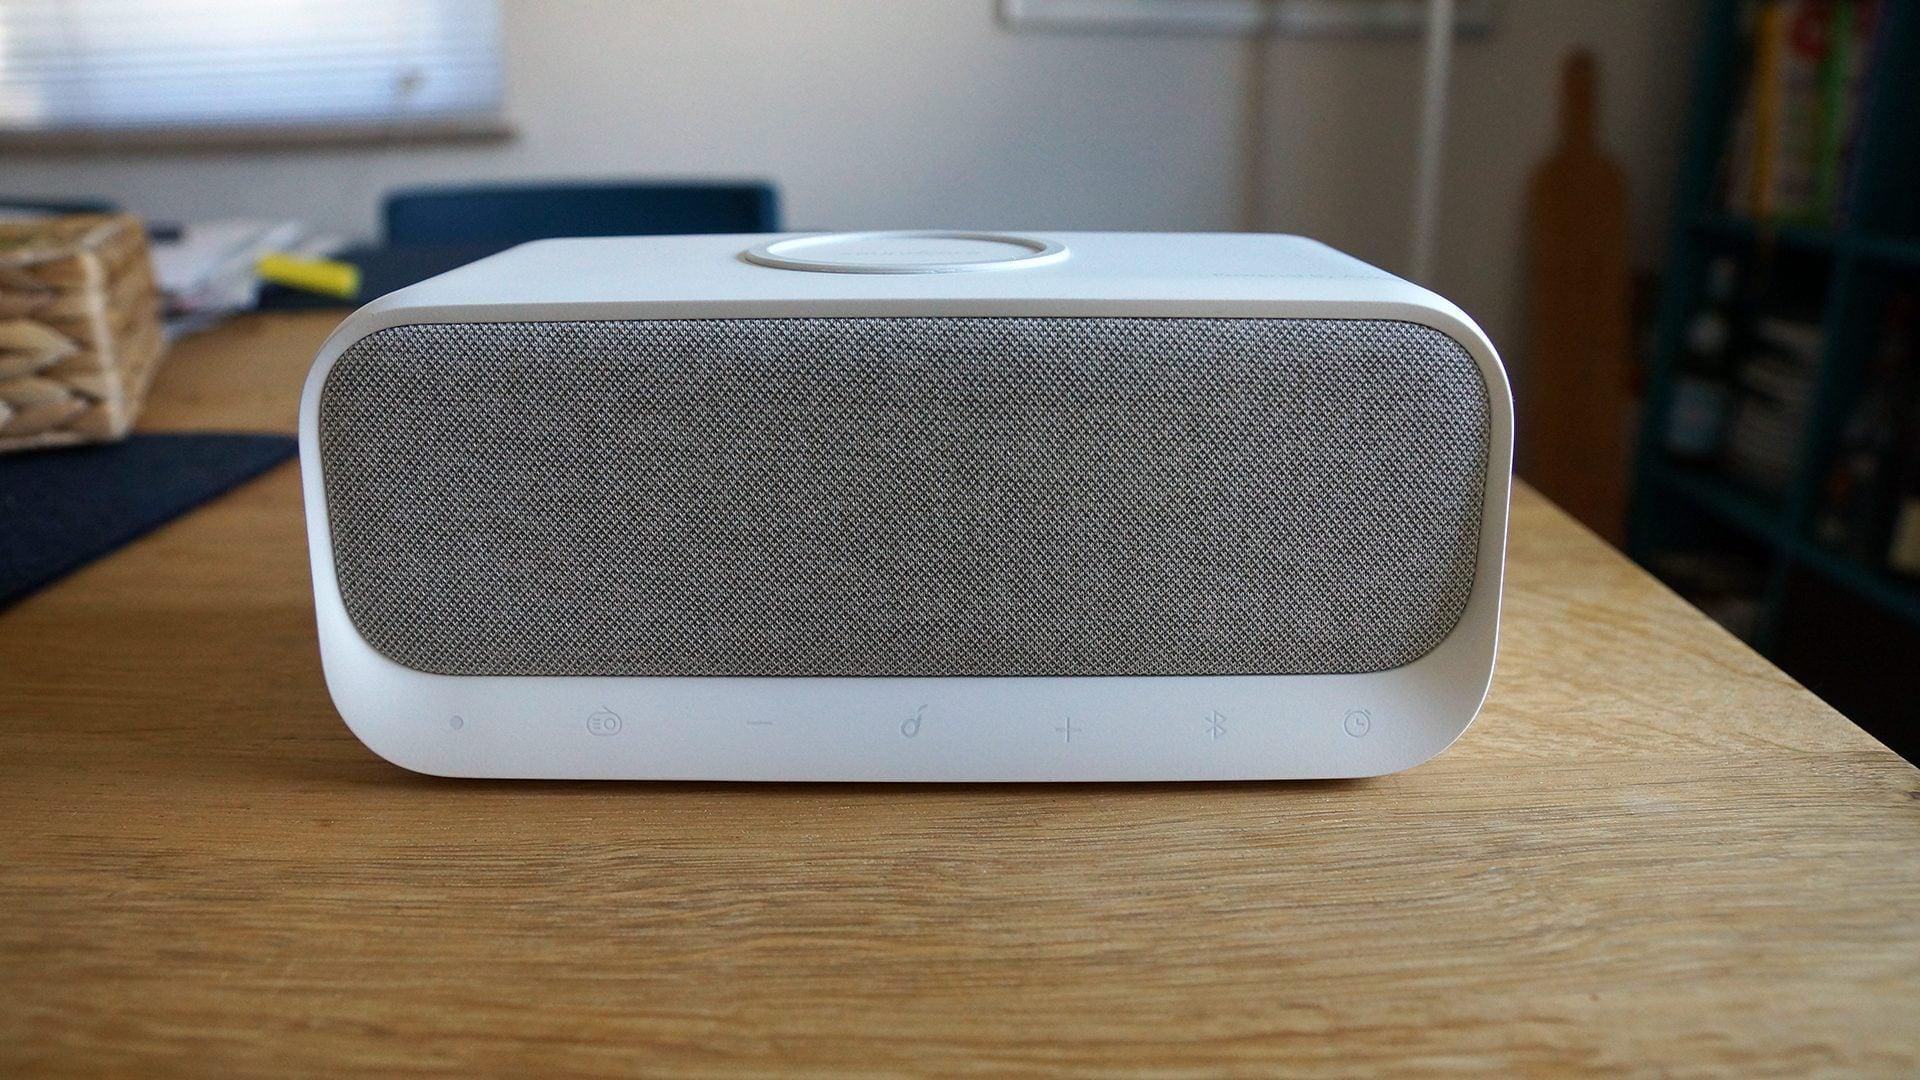 Soundcore Wakey Test – Ankers Radiowecker mit Bluetooth und Ladefunktion 24 techboys.de • smarte News, auf den Punkt! Soundcore Wakey Test – Ankers Radiowecker mit Bluetooth und Ladefunktion